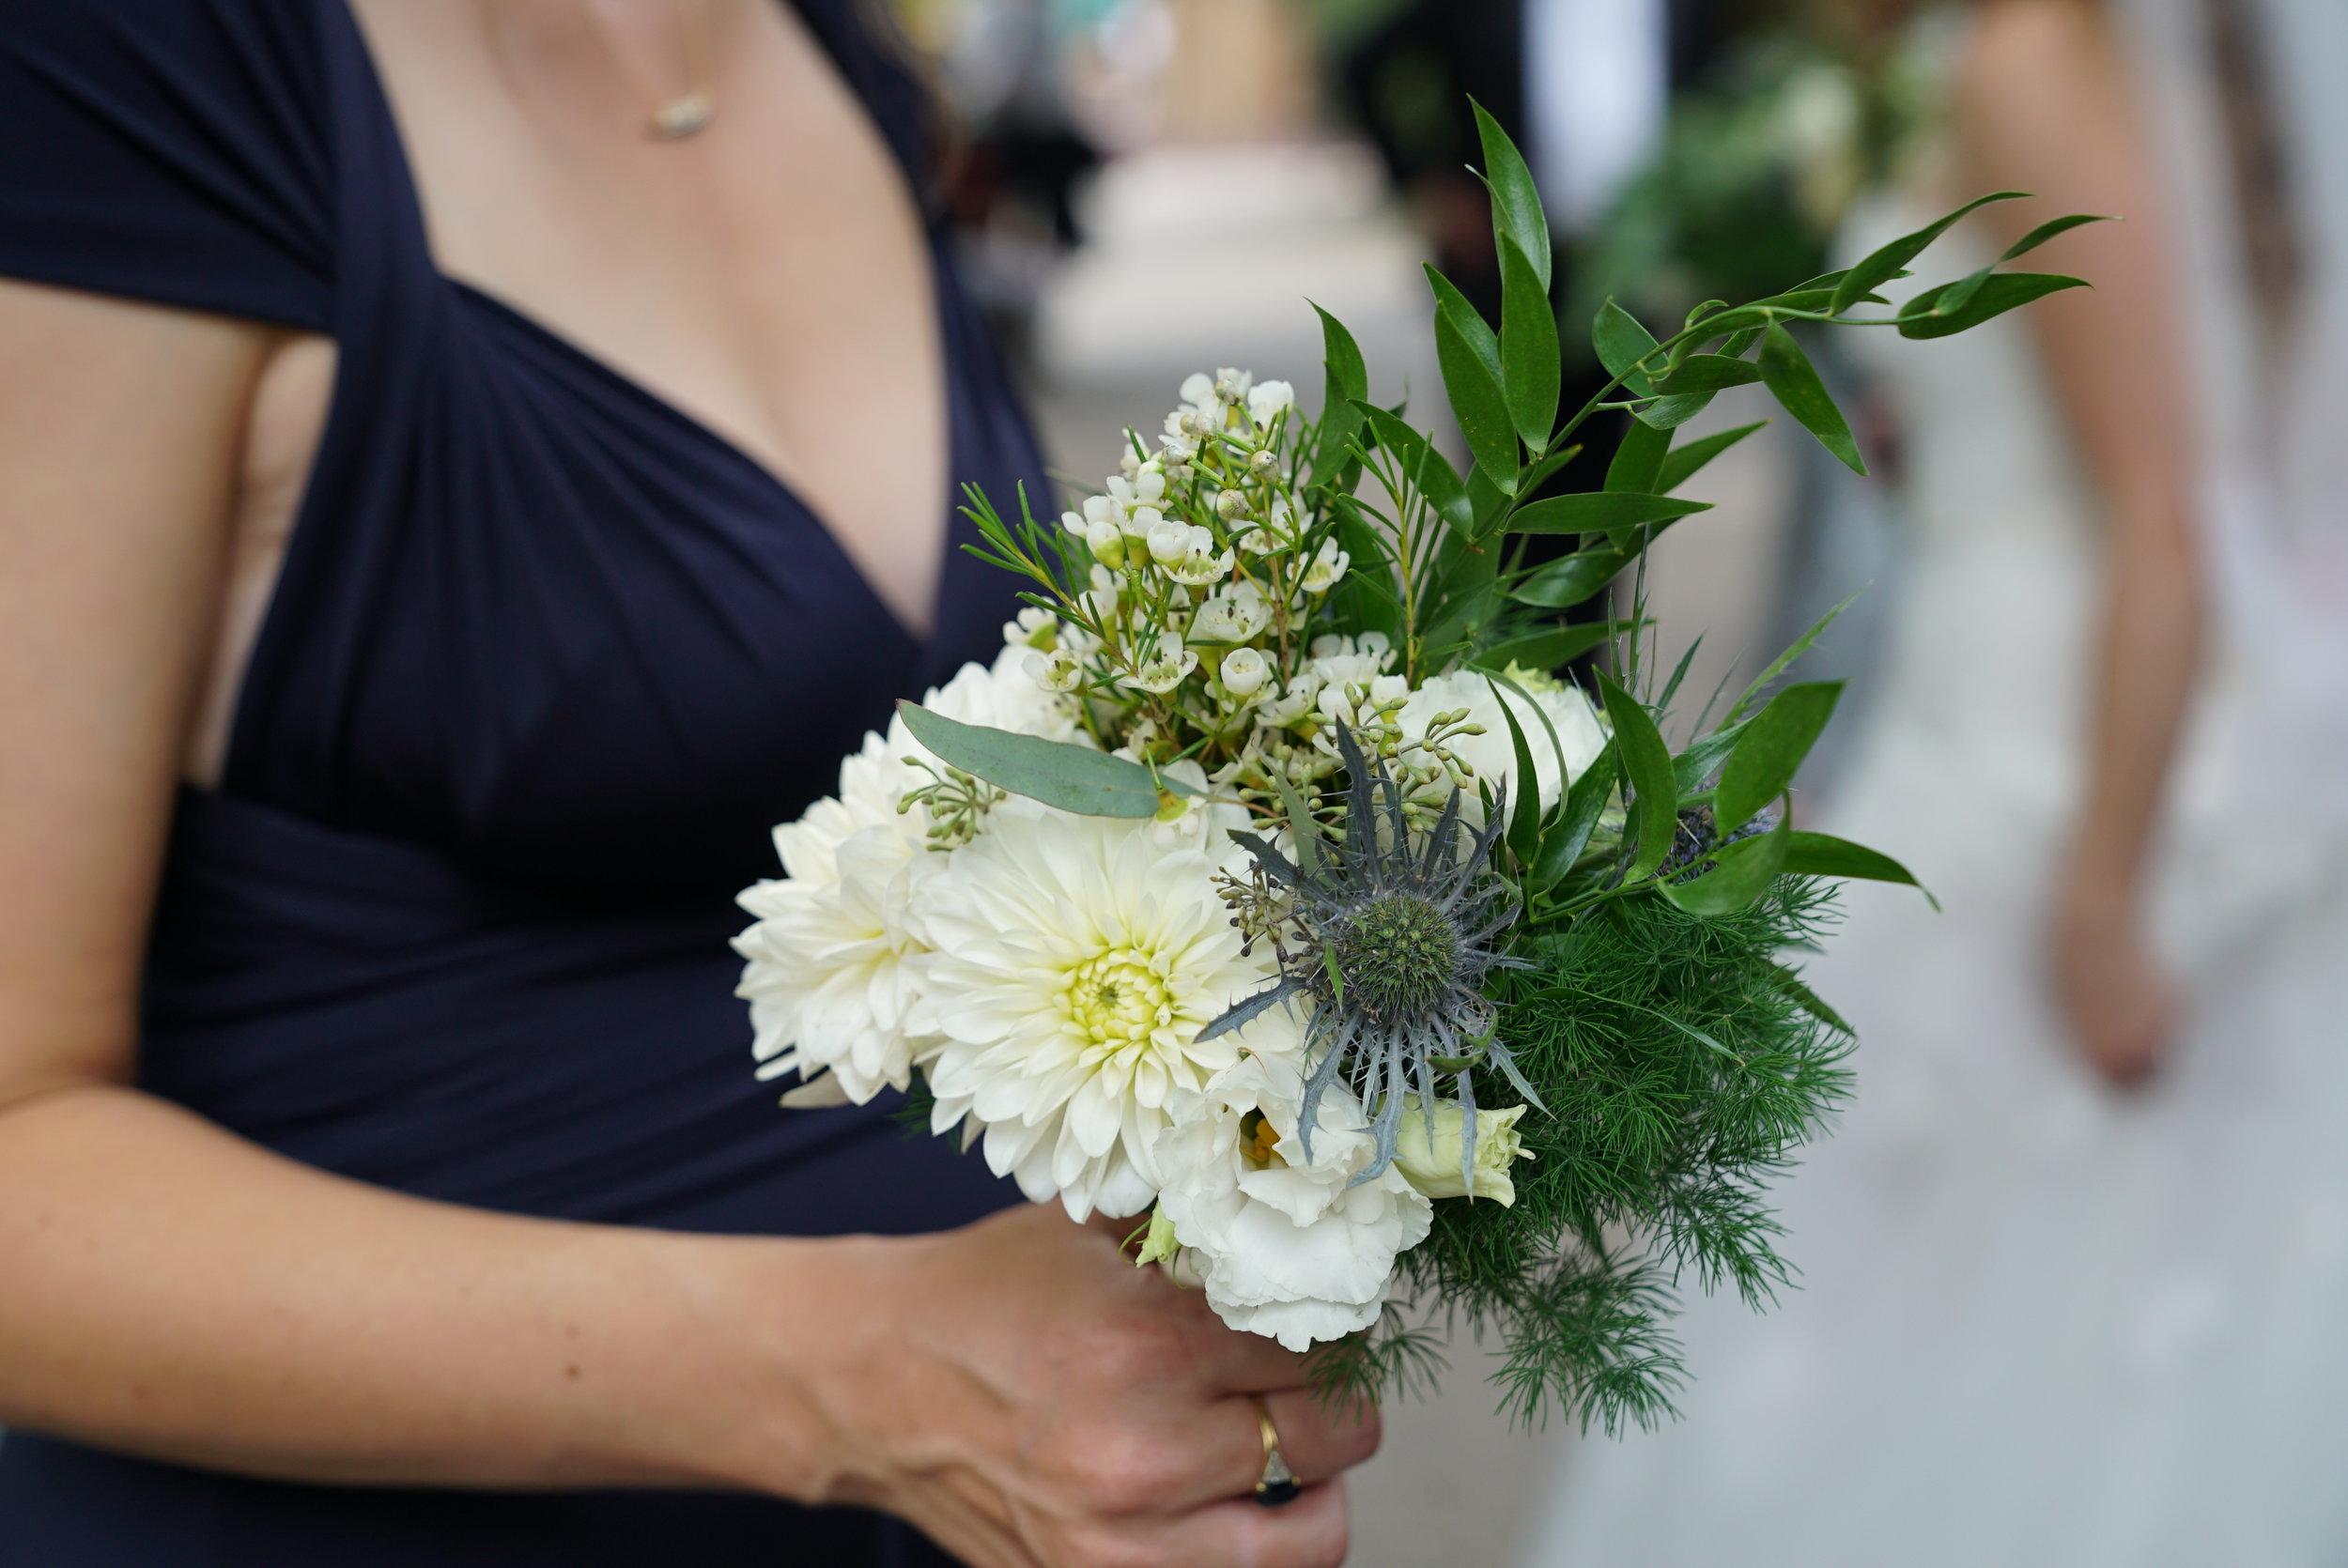 Bridesmaids bouquets were smaller versions of the brides.